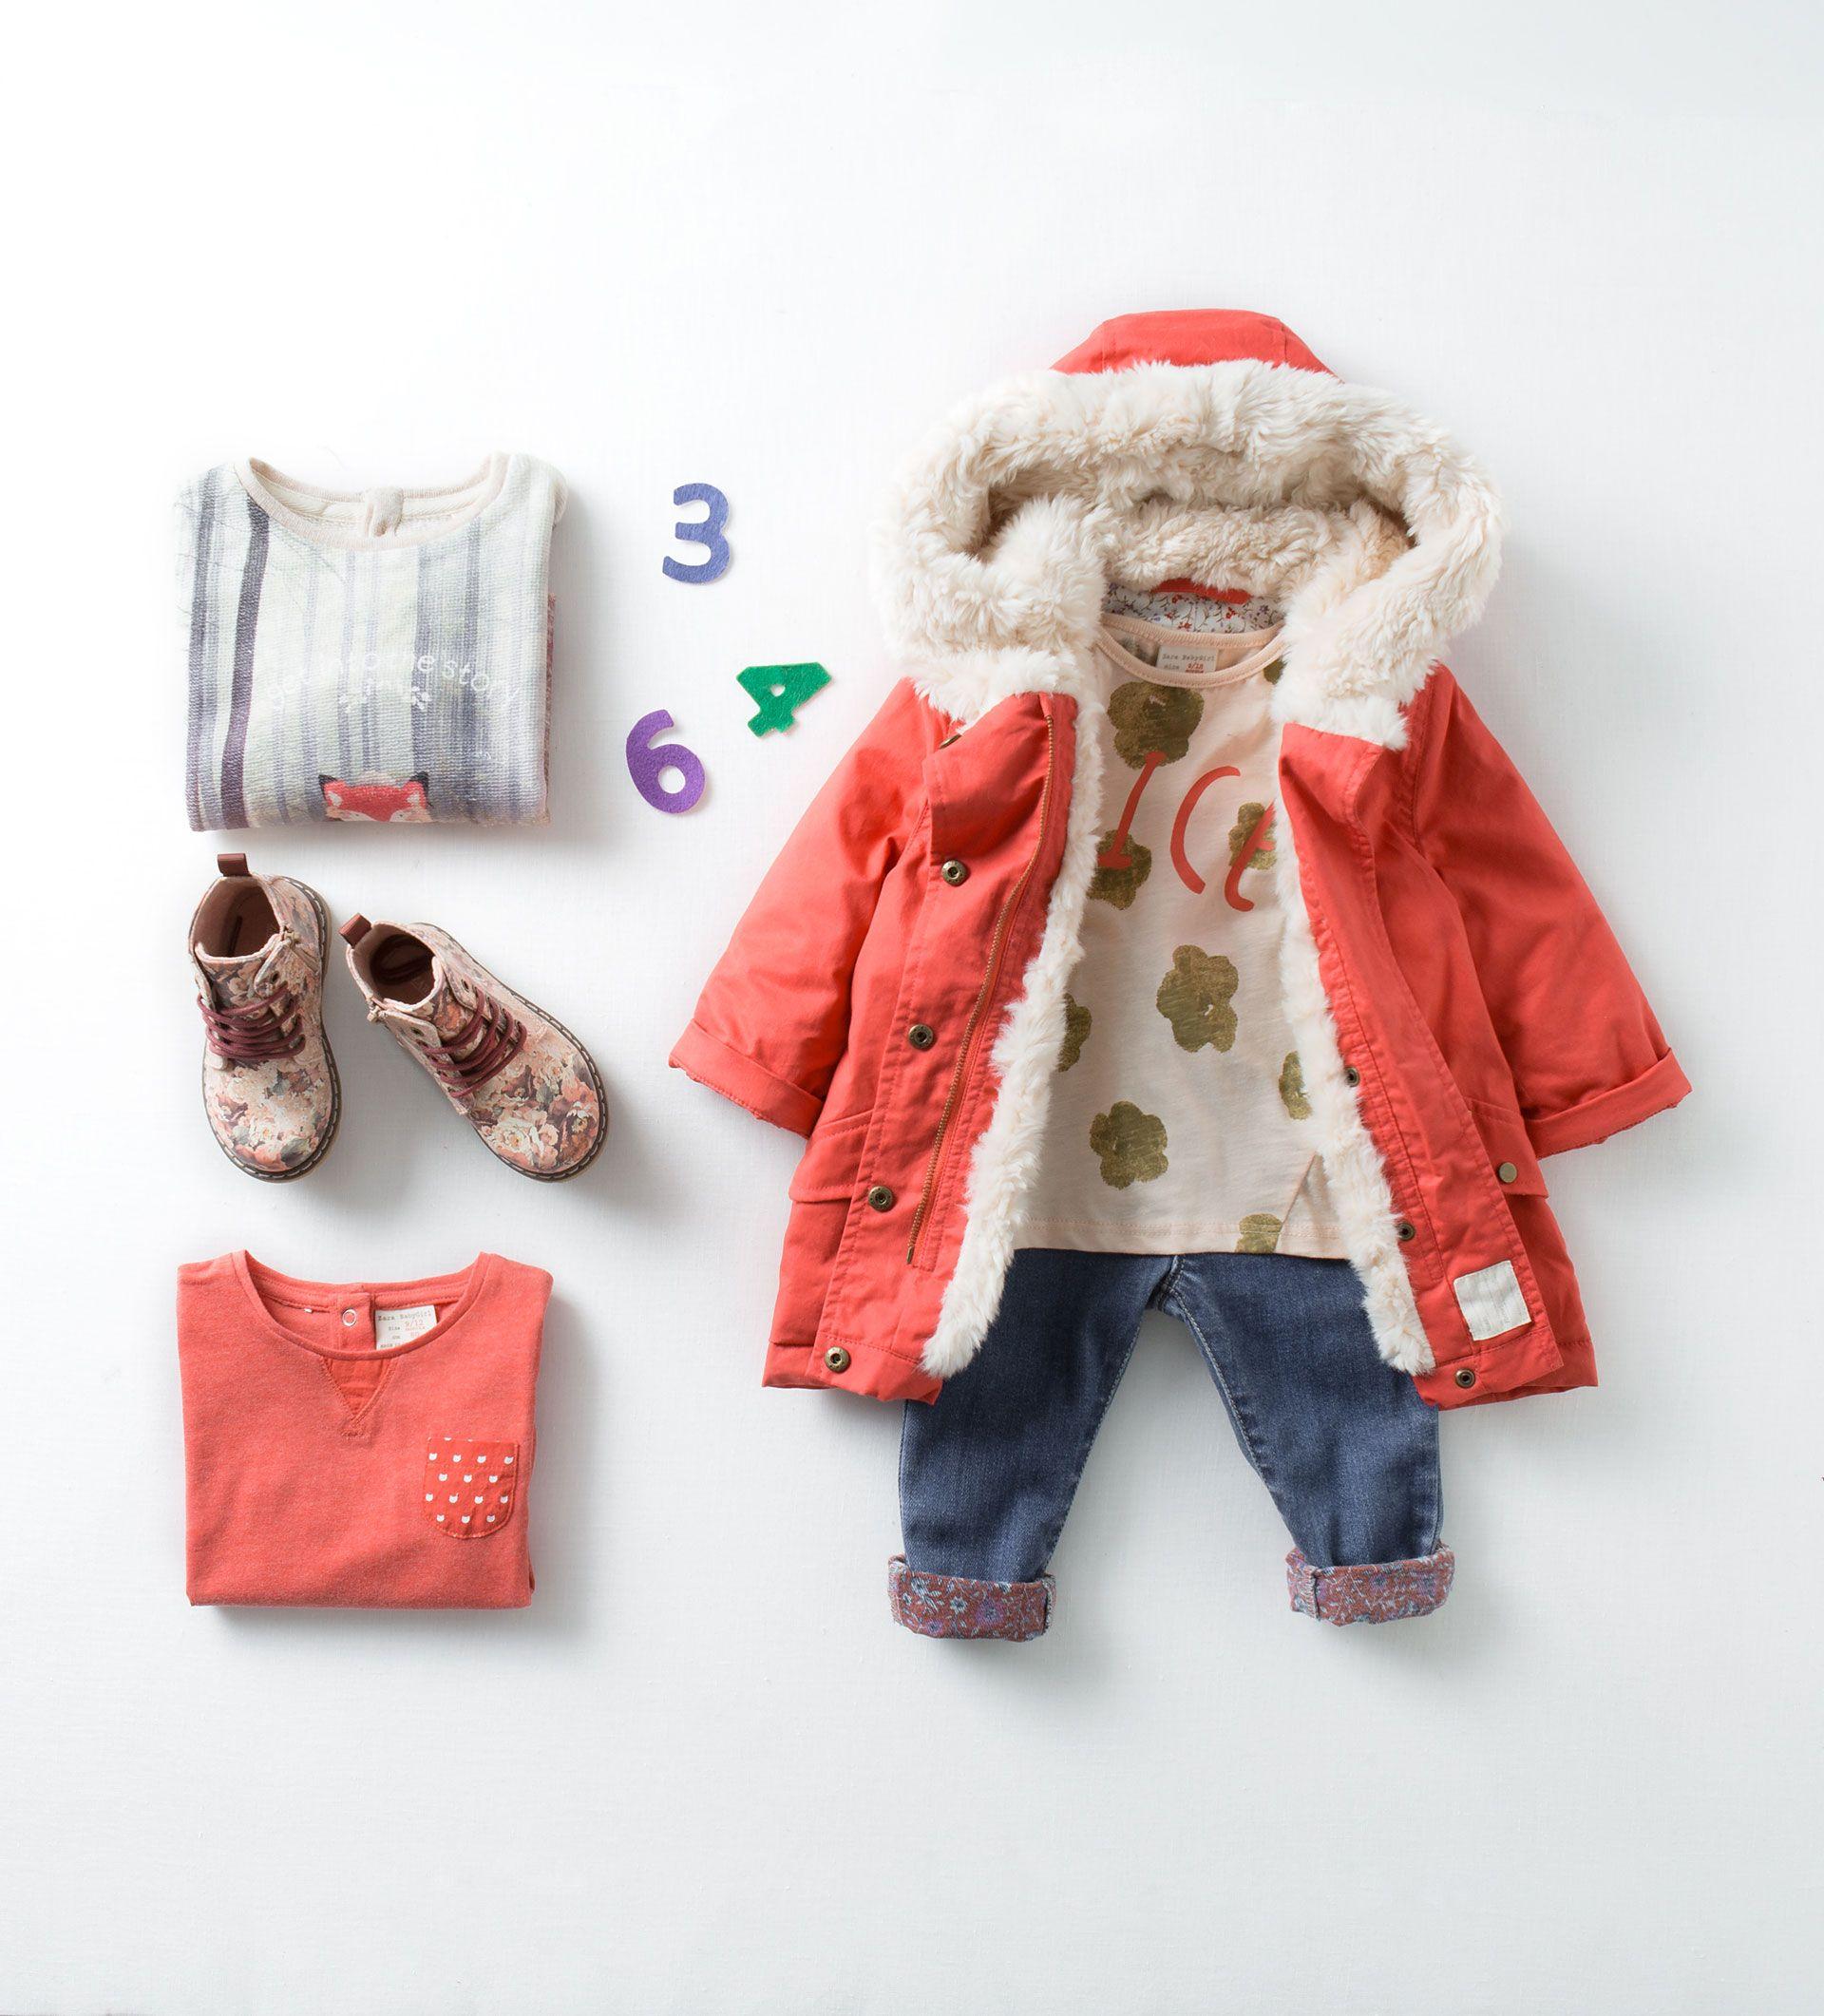 bastante agradable 60c6f 6ca4b Image 1 of from Zara | Little Girls Wear | Baby girl fashion ...